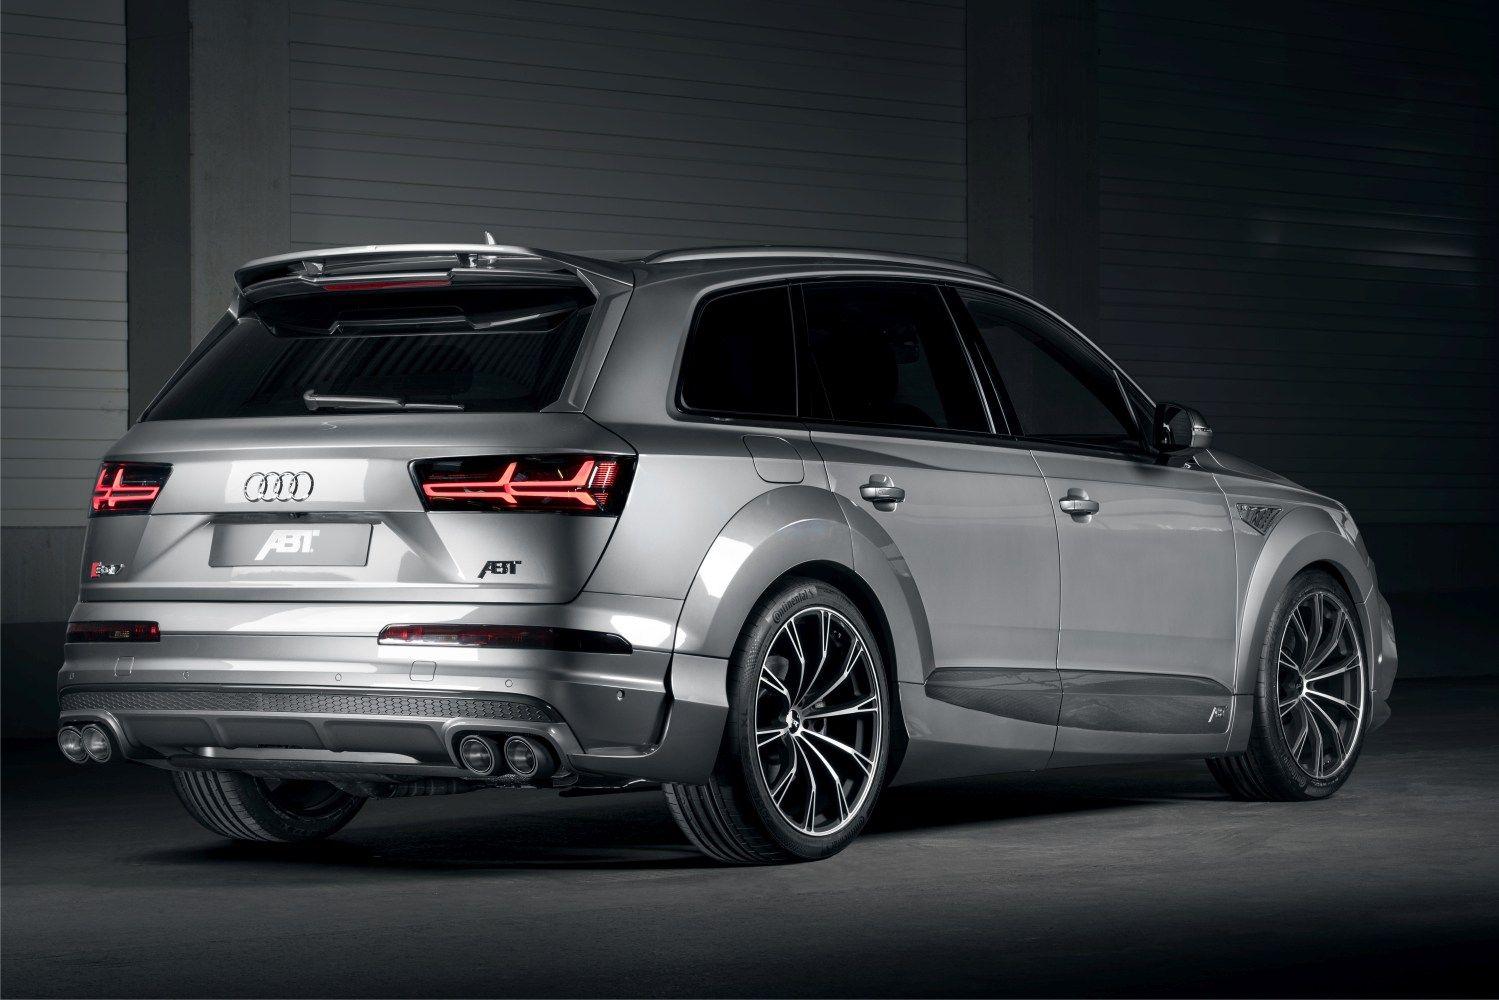 Abt Audi Sq7 Tdi Super Utility Vehicle Audi Luxury Suv Cars Audi Cars